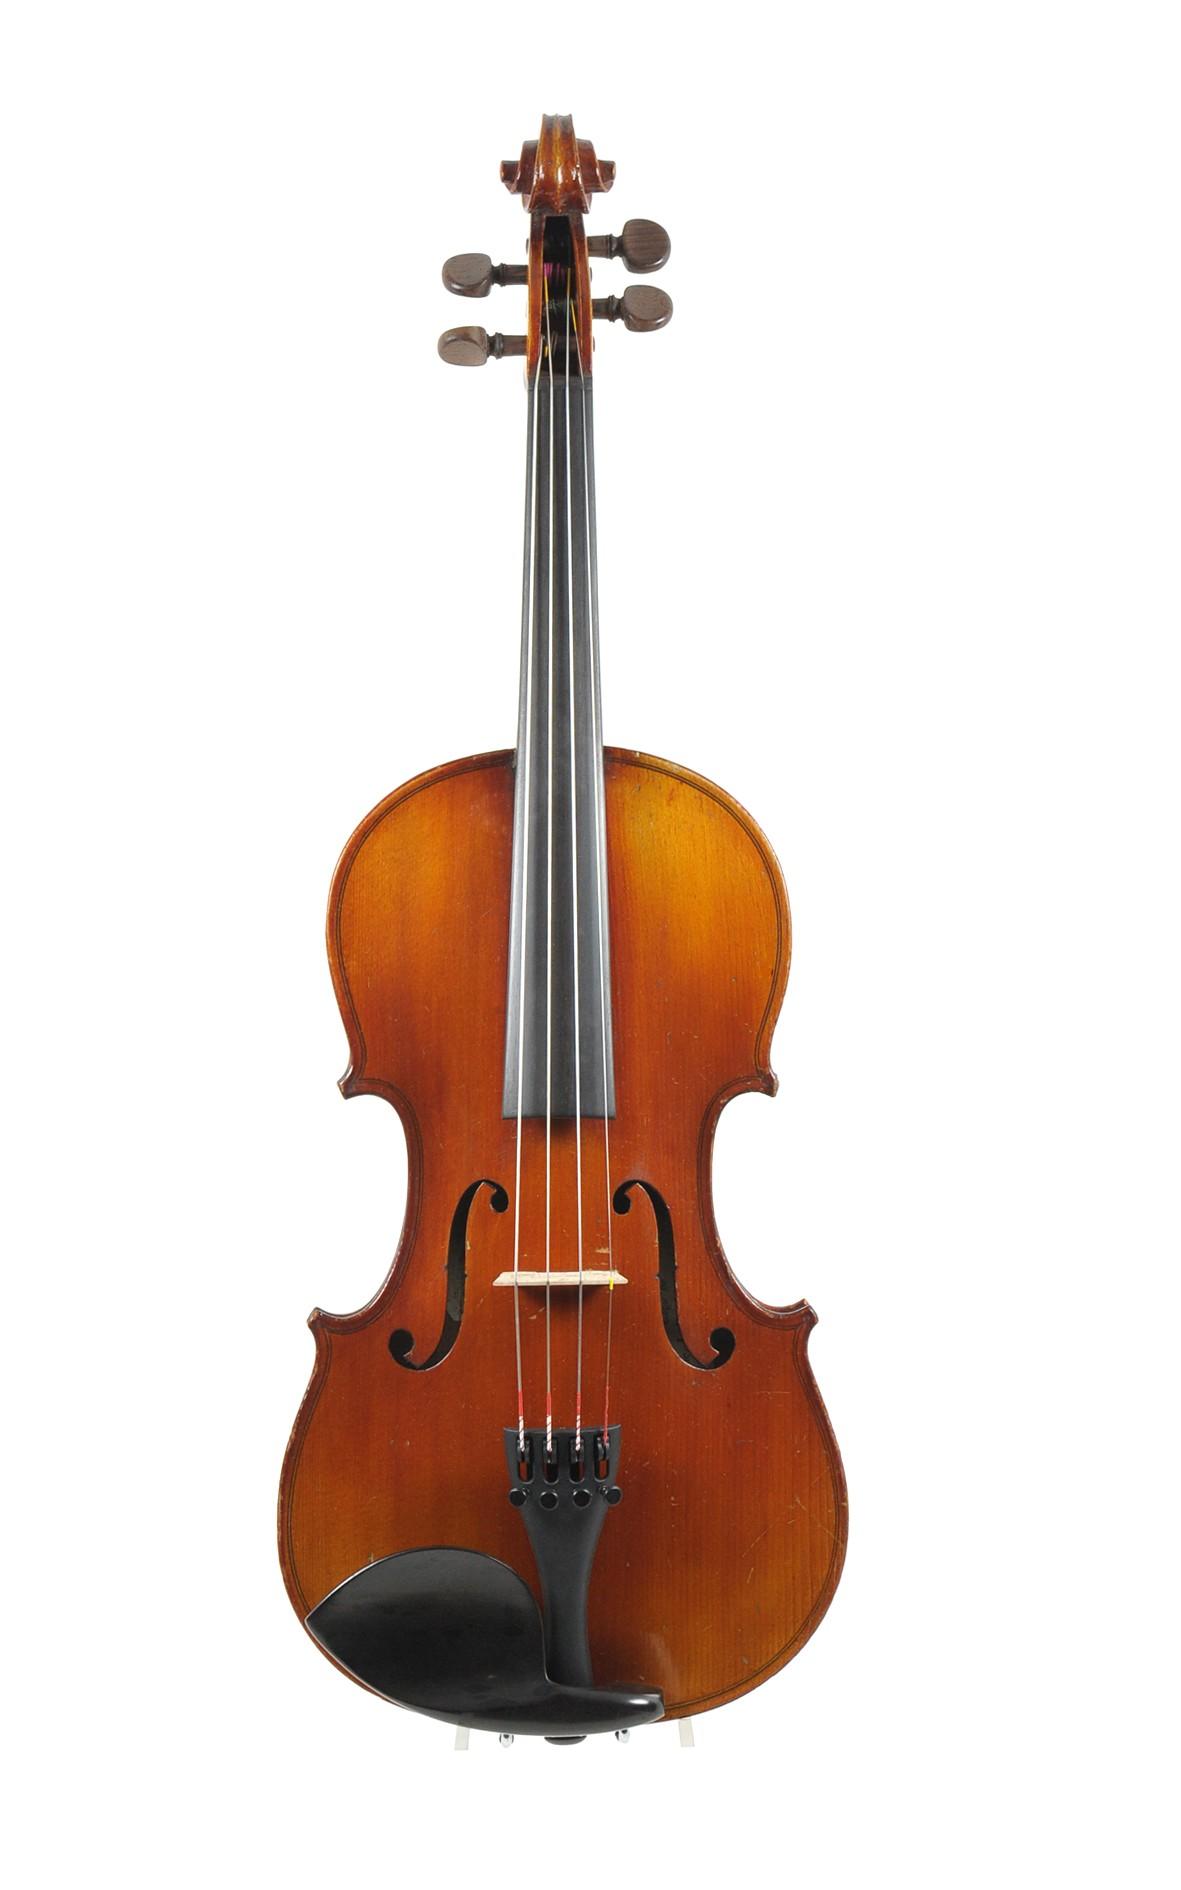 French violin, 3/4 antique Mirecourt violin - top